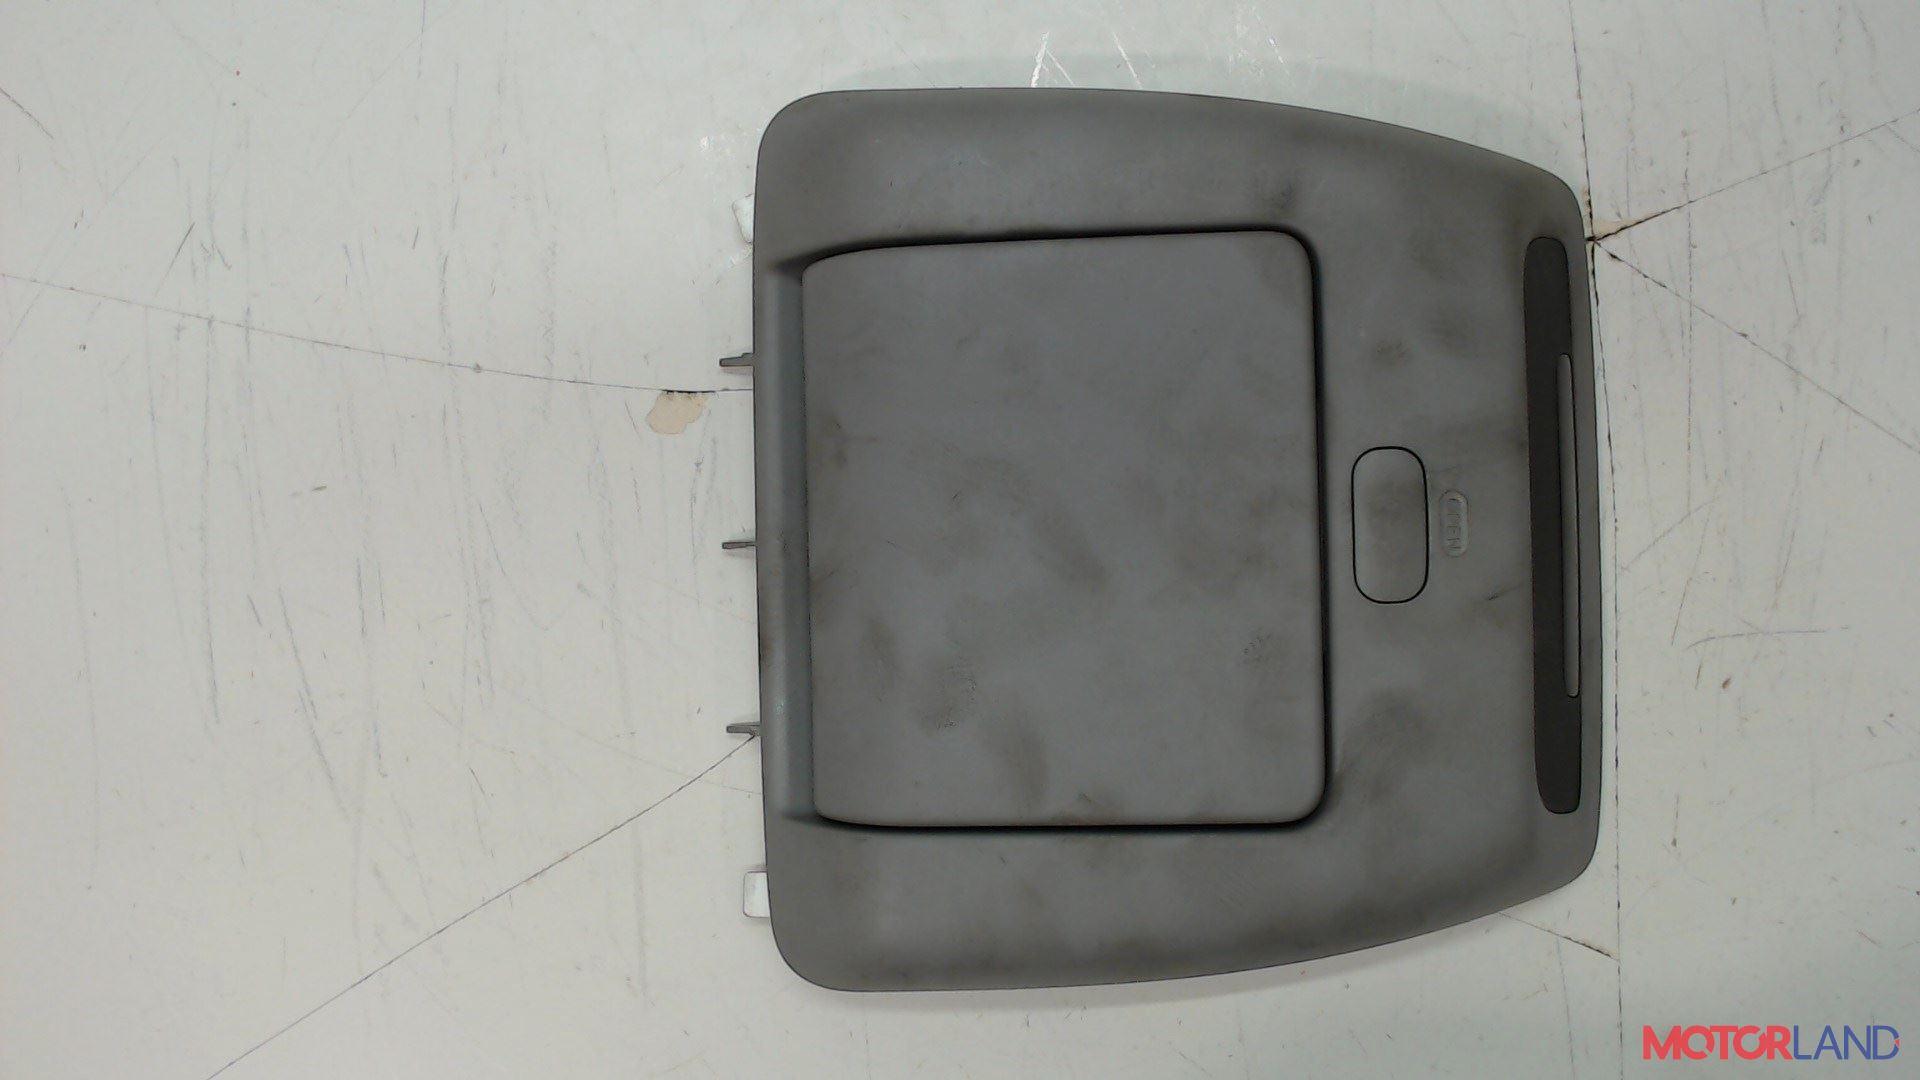 Дисплей компьютера [AdditionalType] Acura MDX 2001-2006, [КонстрНомер-Артикул] #1